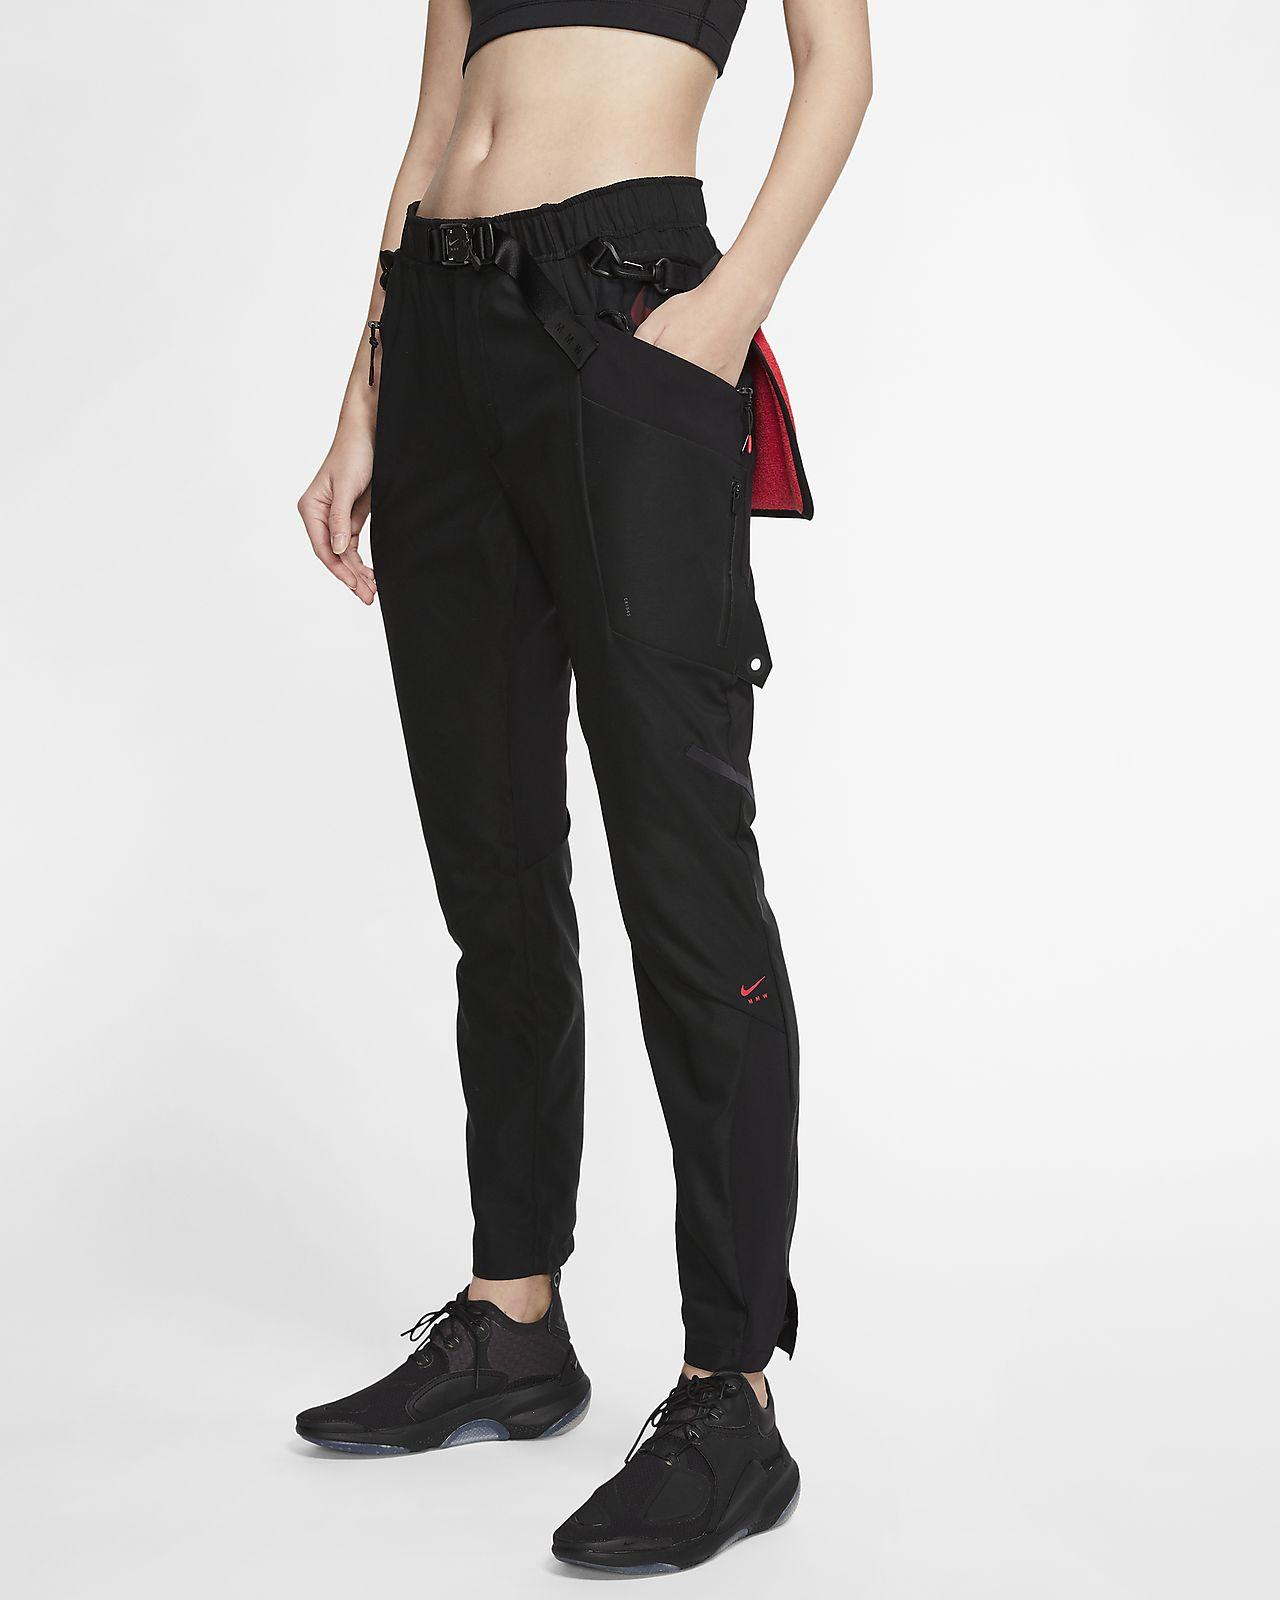 Nike x MMW Women's Pants